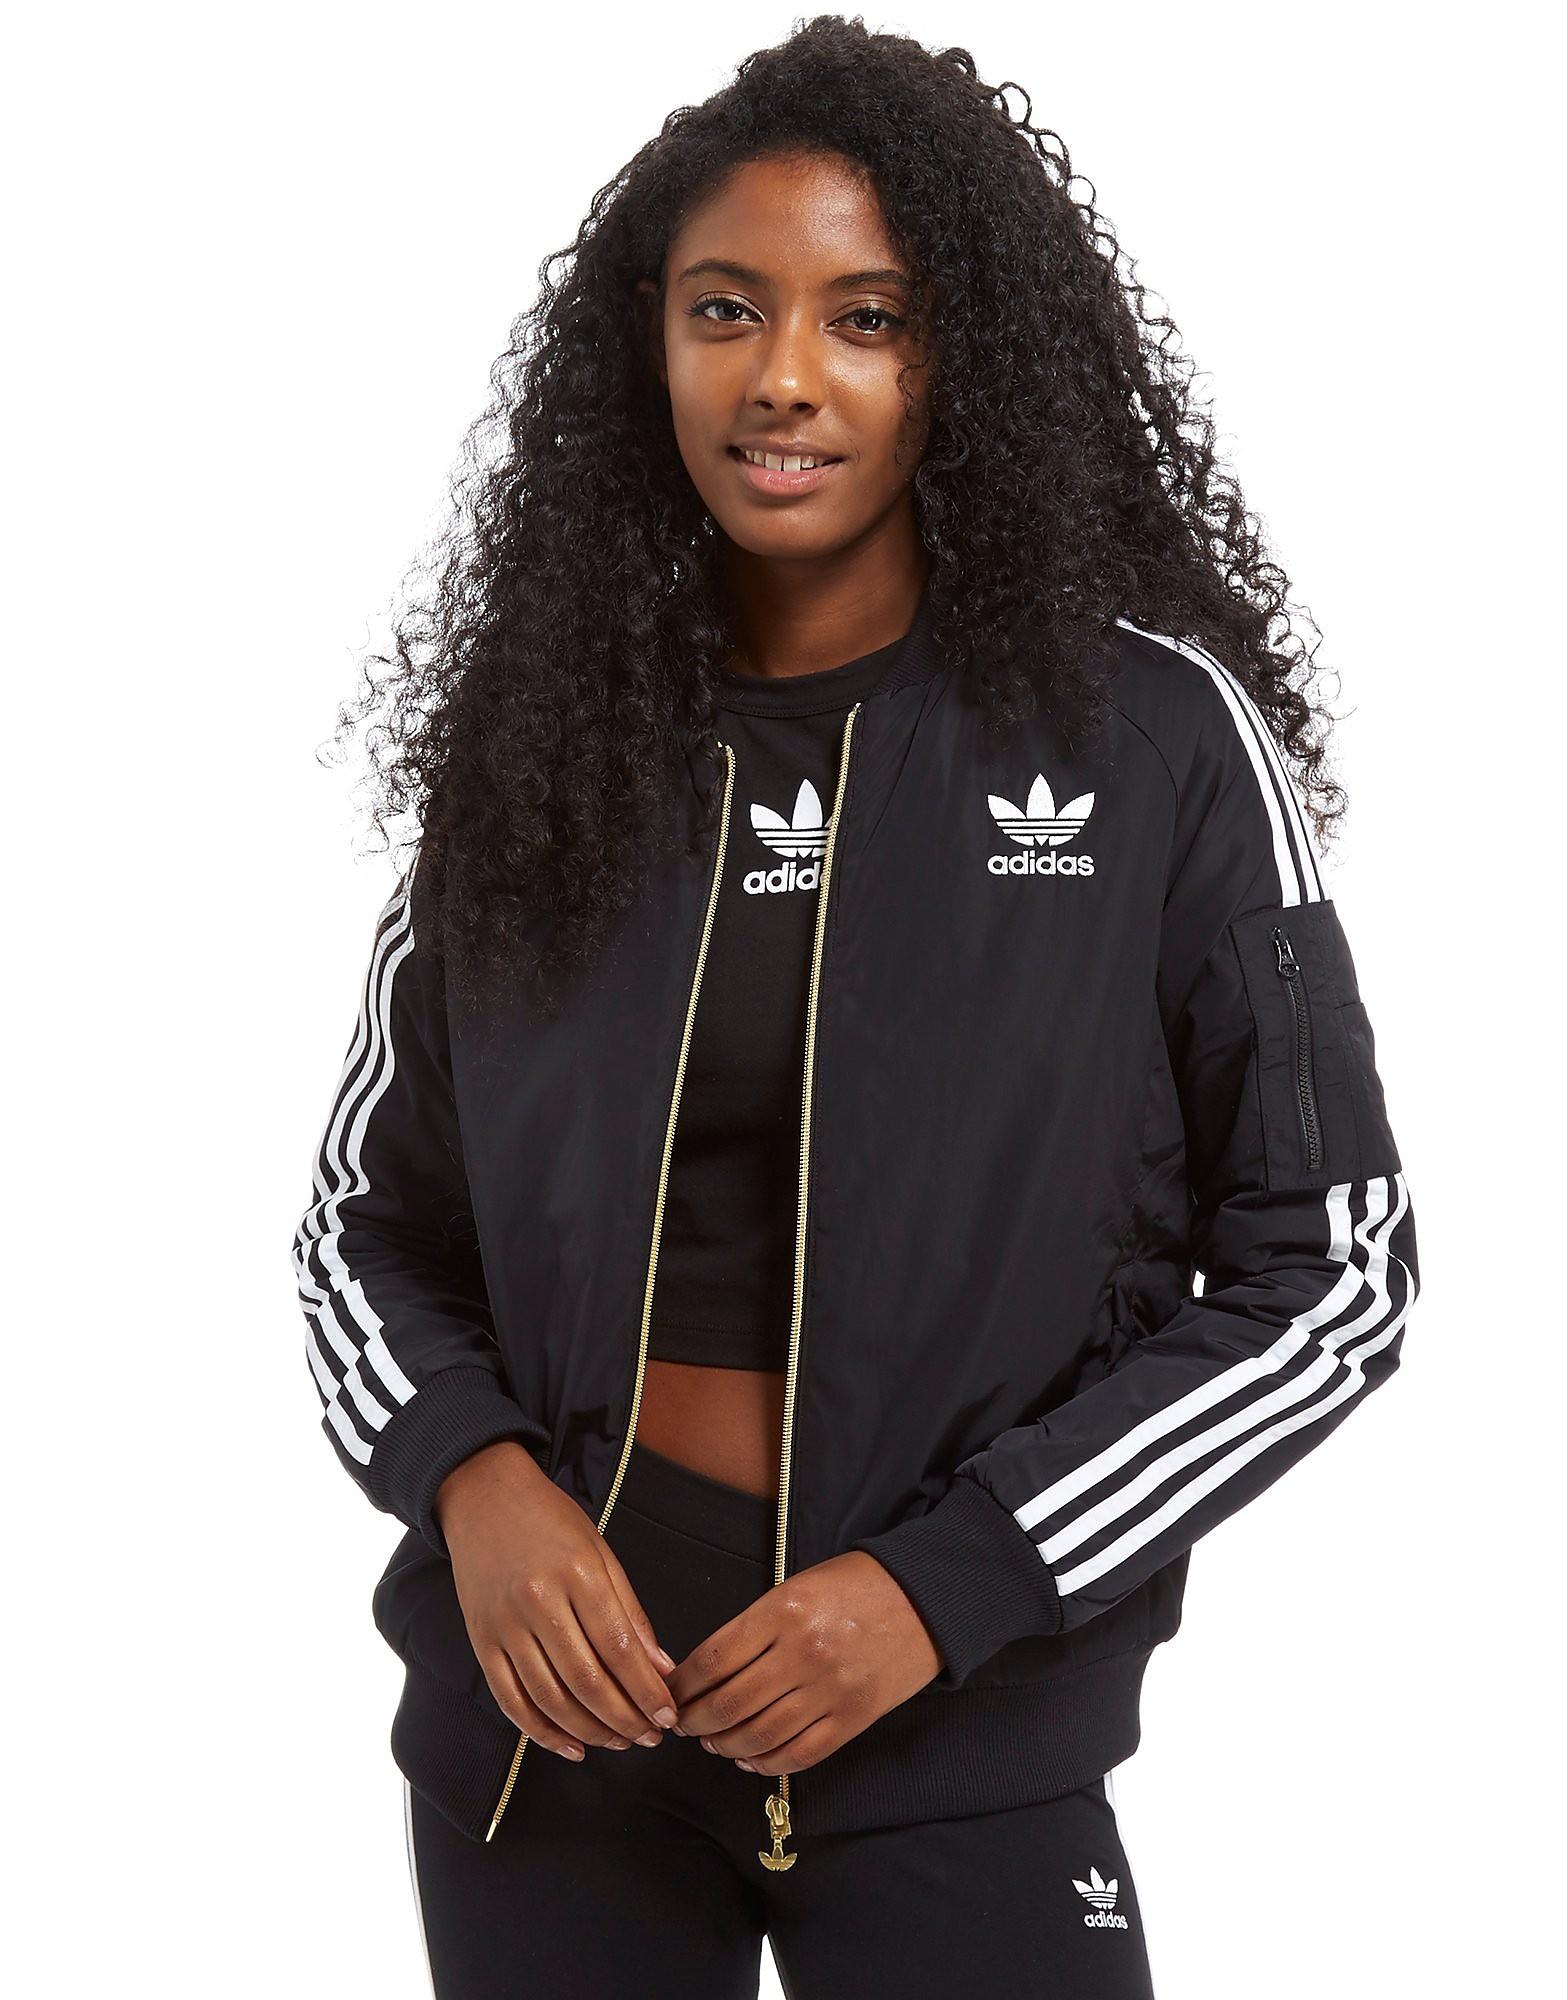 adidas Originals Originals Superstar Jacket Femme